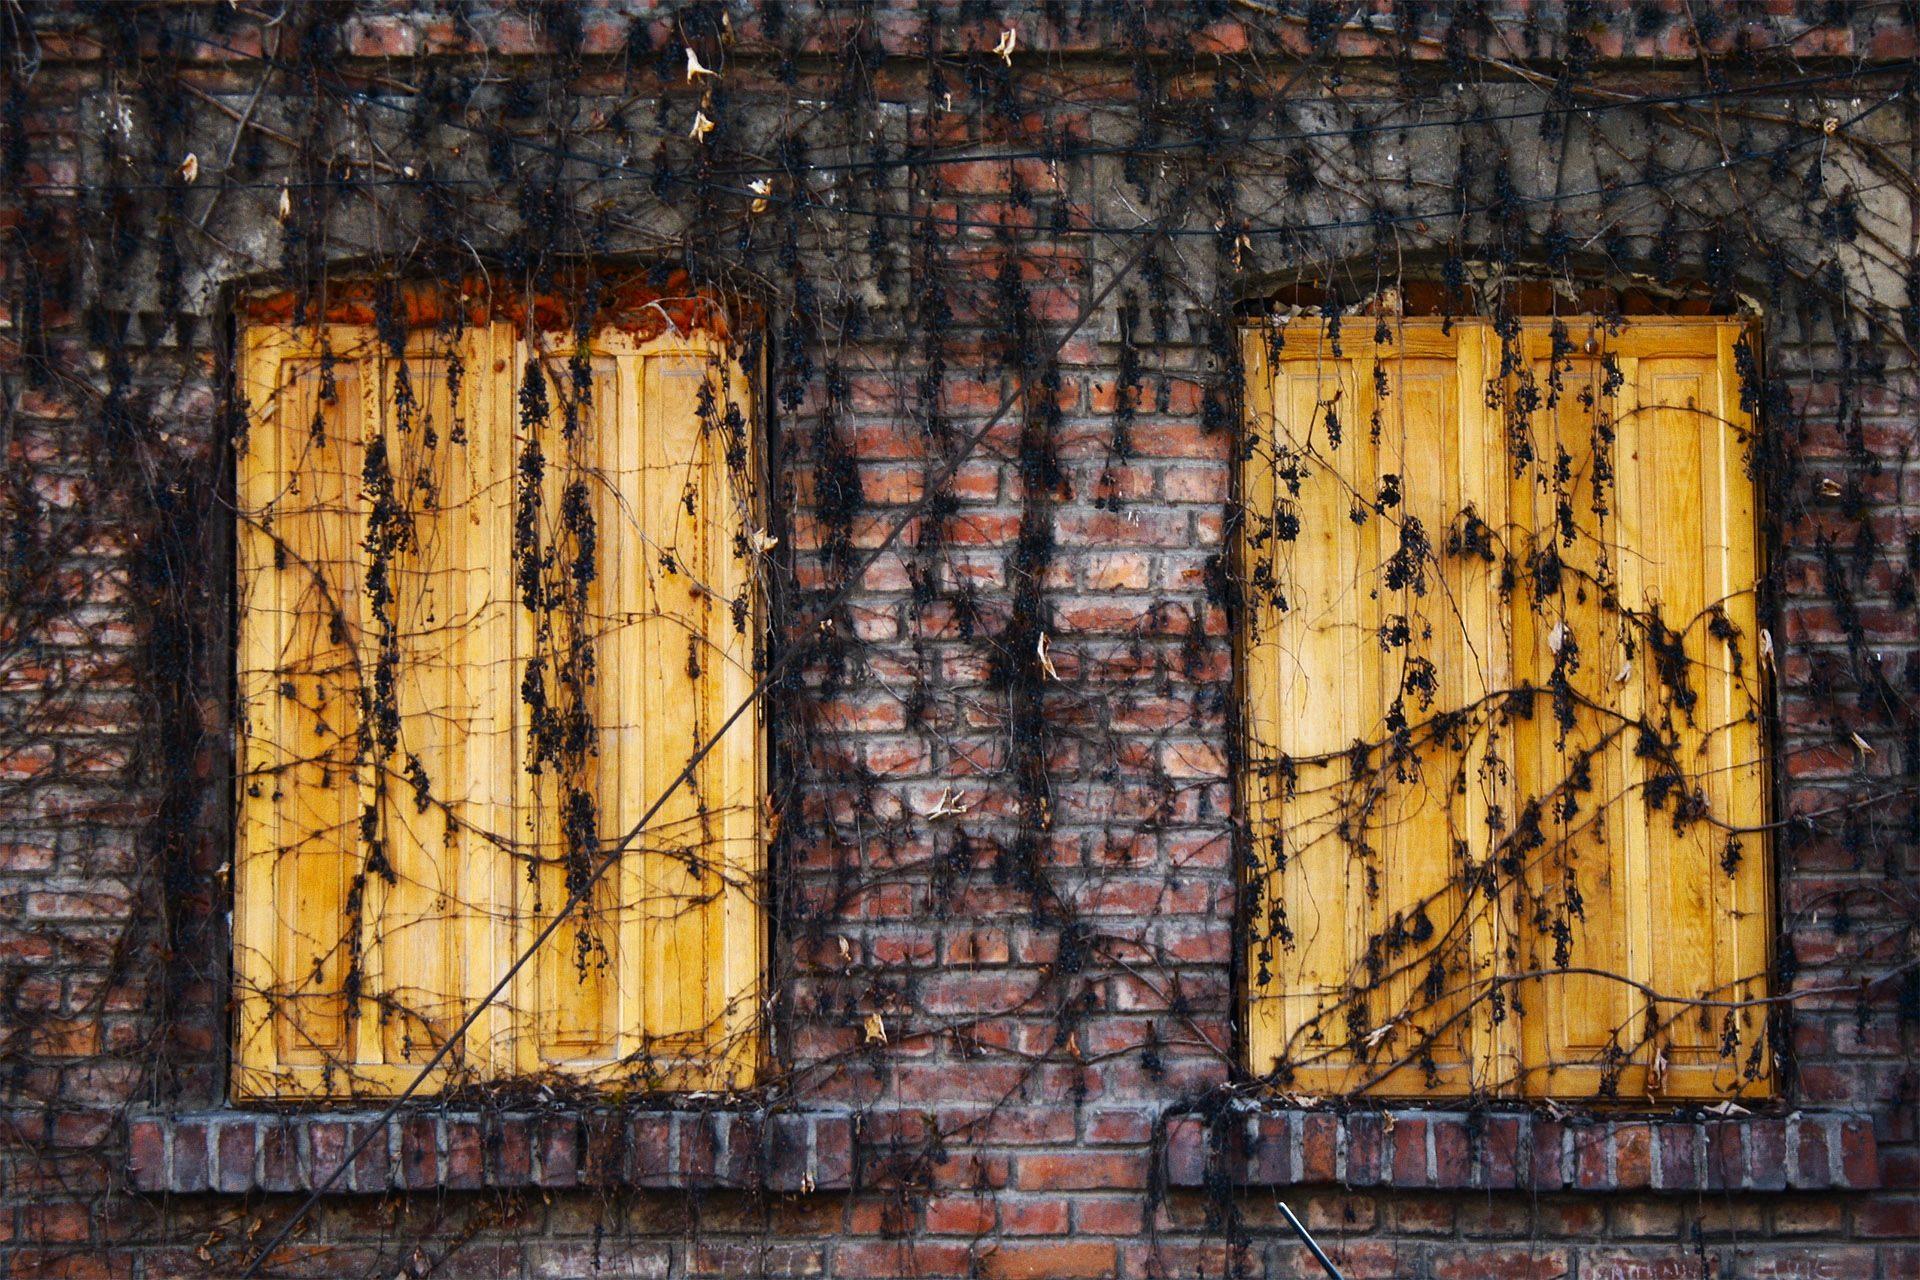 Windows, Σπίτι, enrredaderas, φυτά, ξηρά - Wallpapers HD - Professor-falken.com